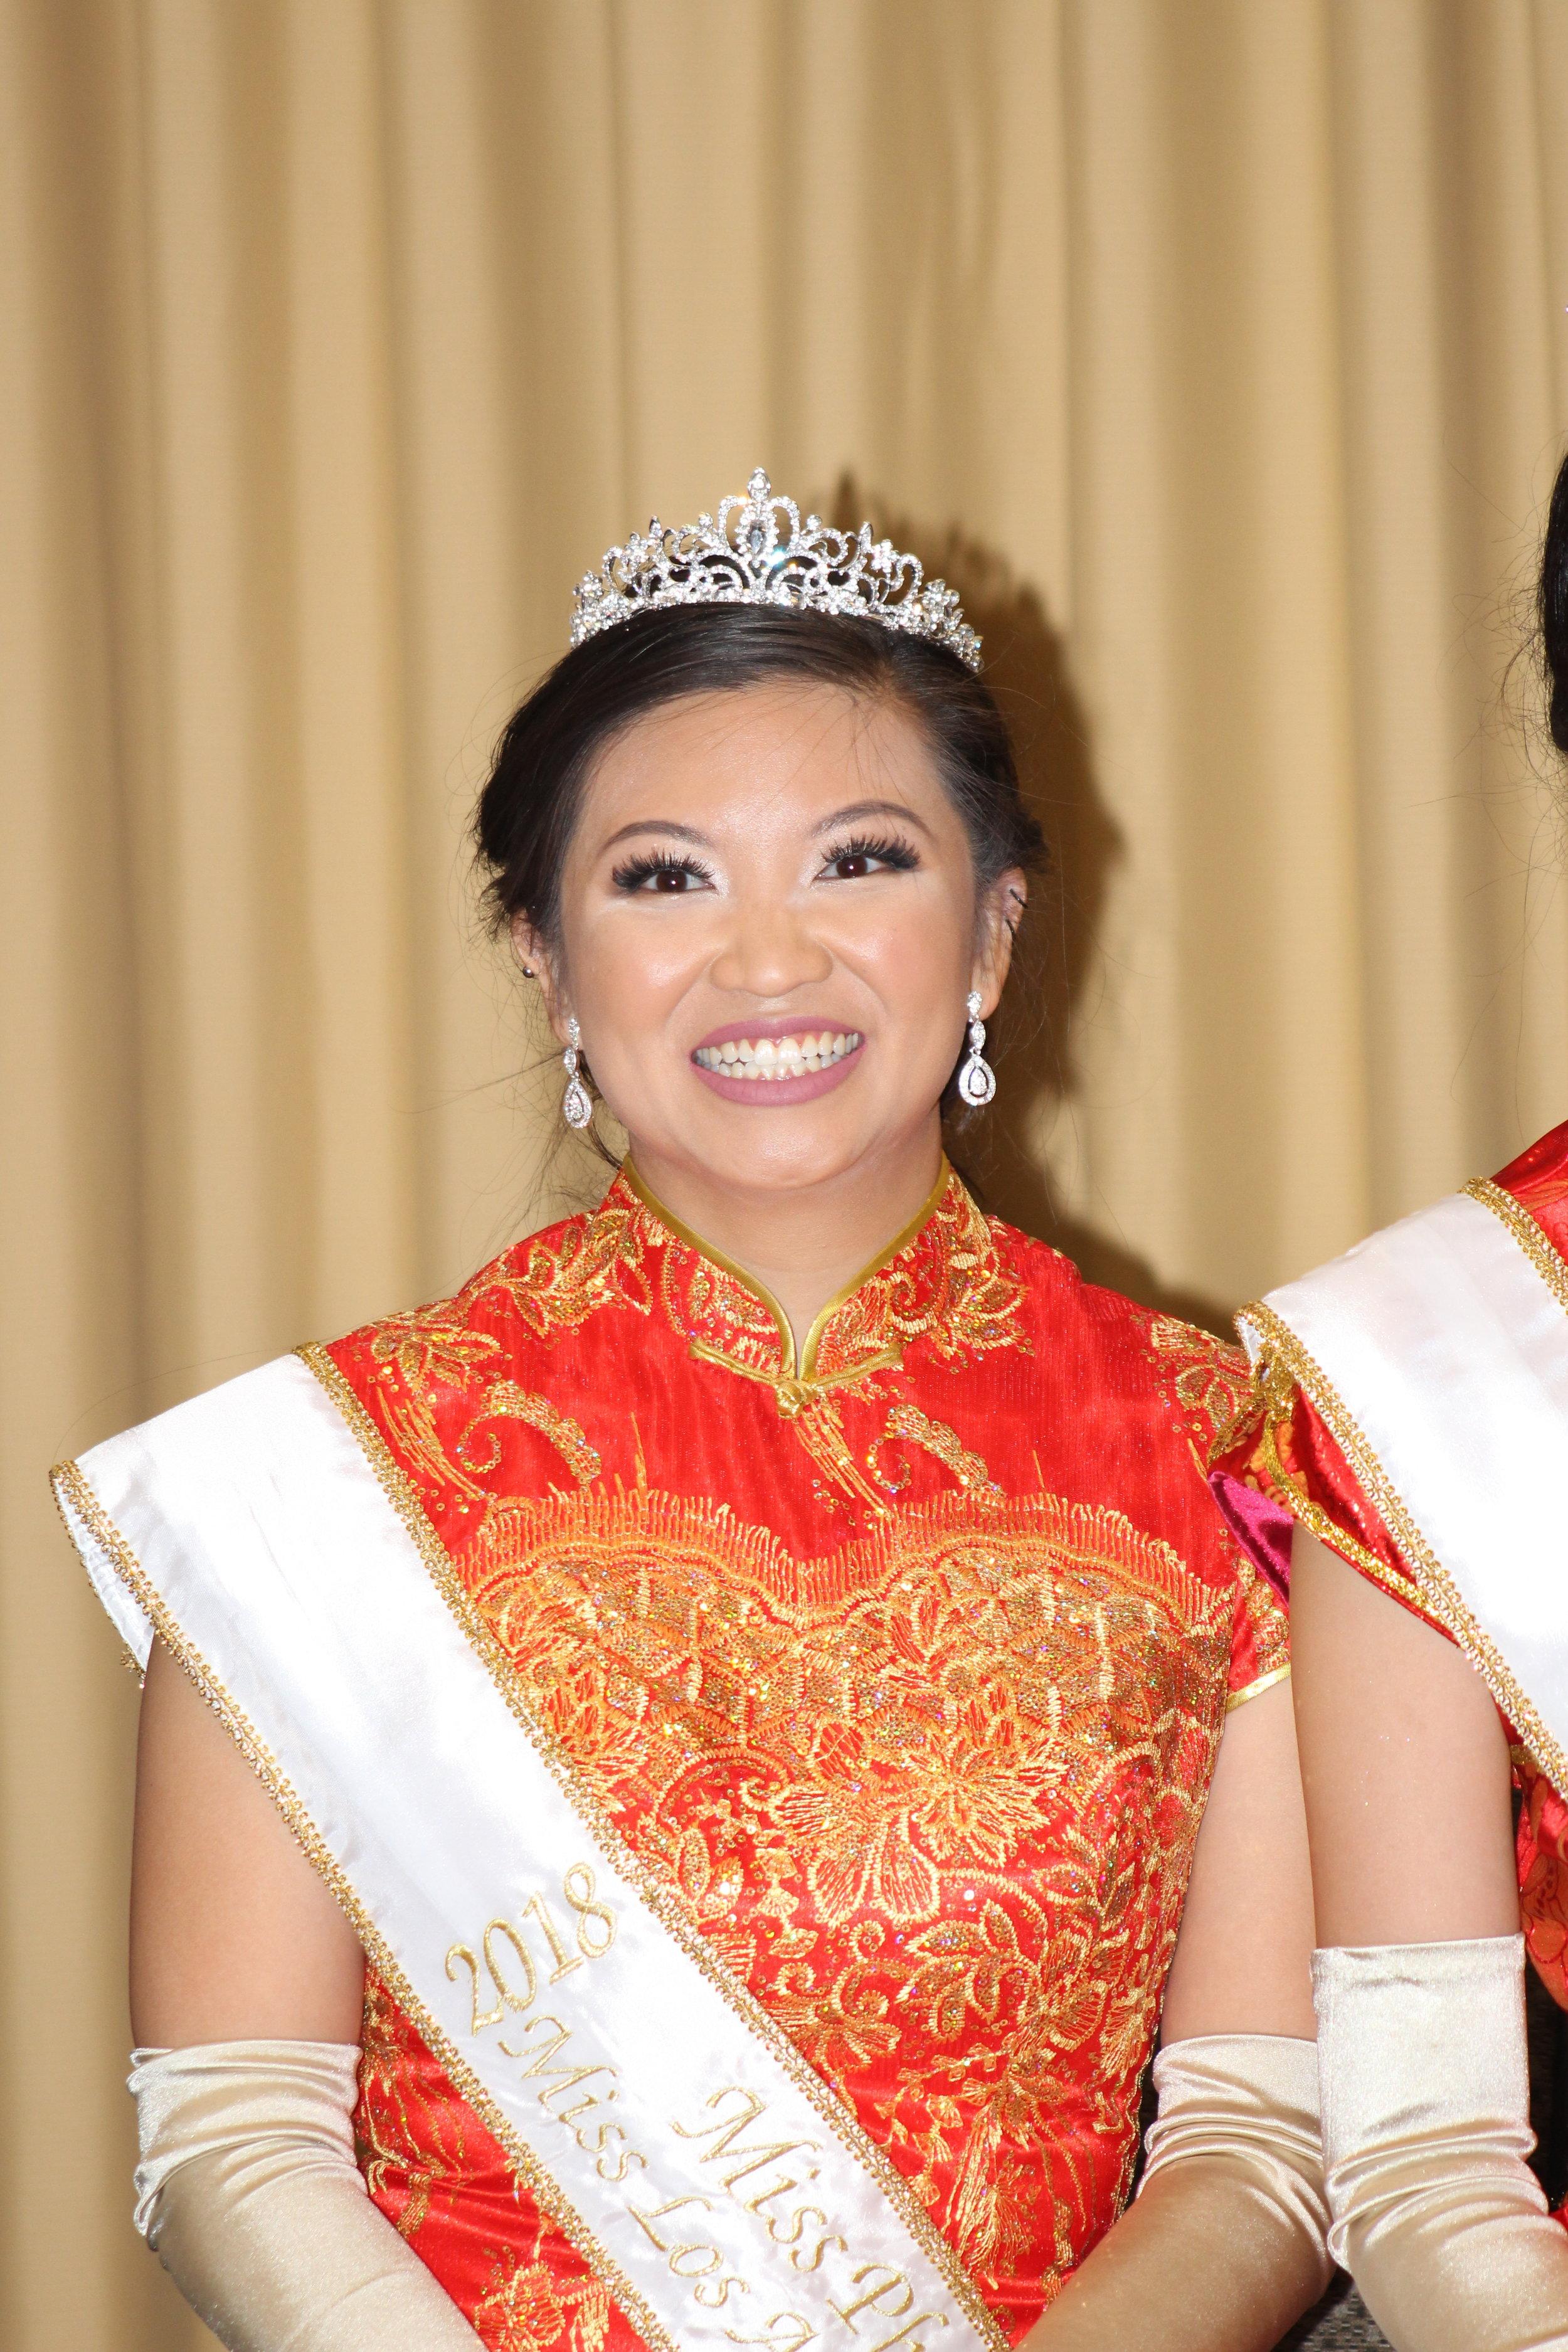 Miss Photogenic & Miss Friendship, Sally Yu